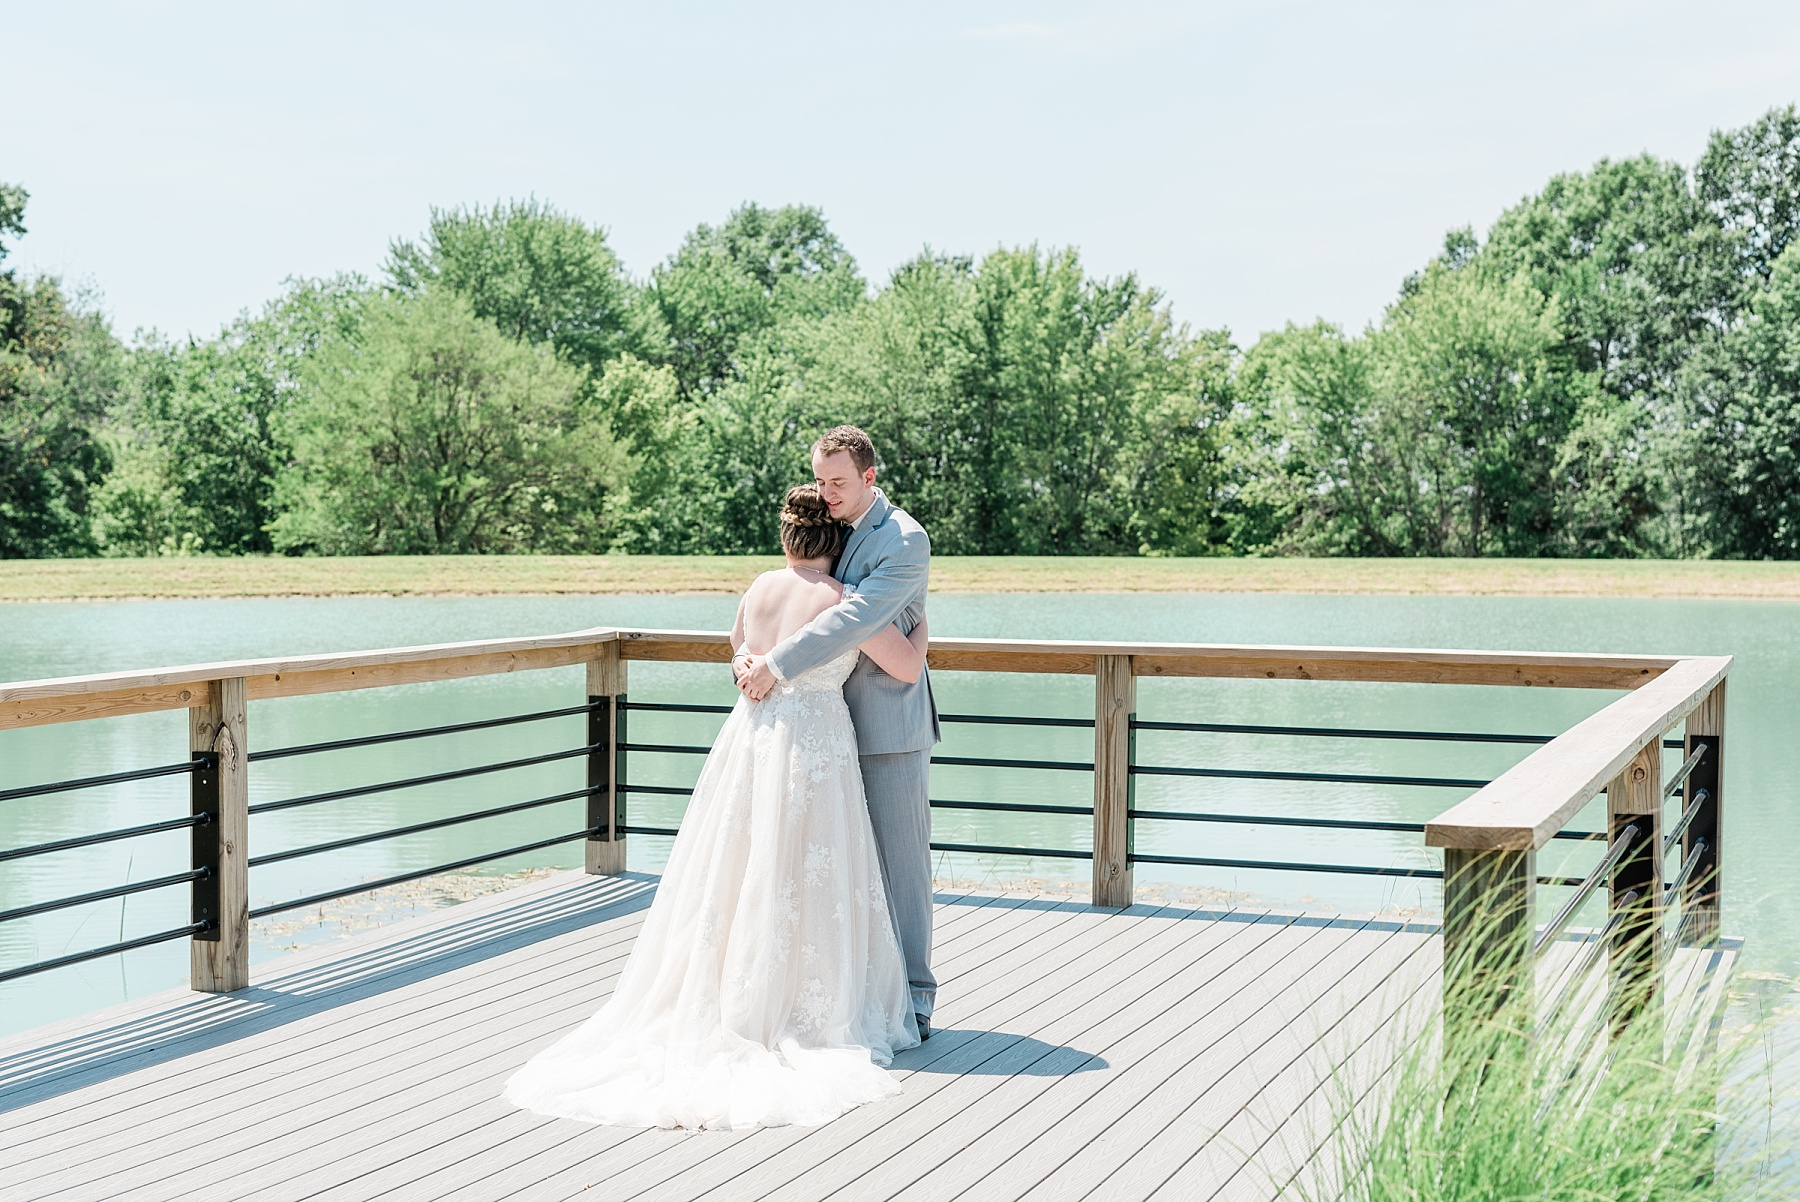 Intimate Summer Wedding at Emerson Fields by Kelsi Kliethermes Photography Best Missouri and Maui Wedding Photographer_0027.jpg